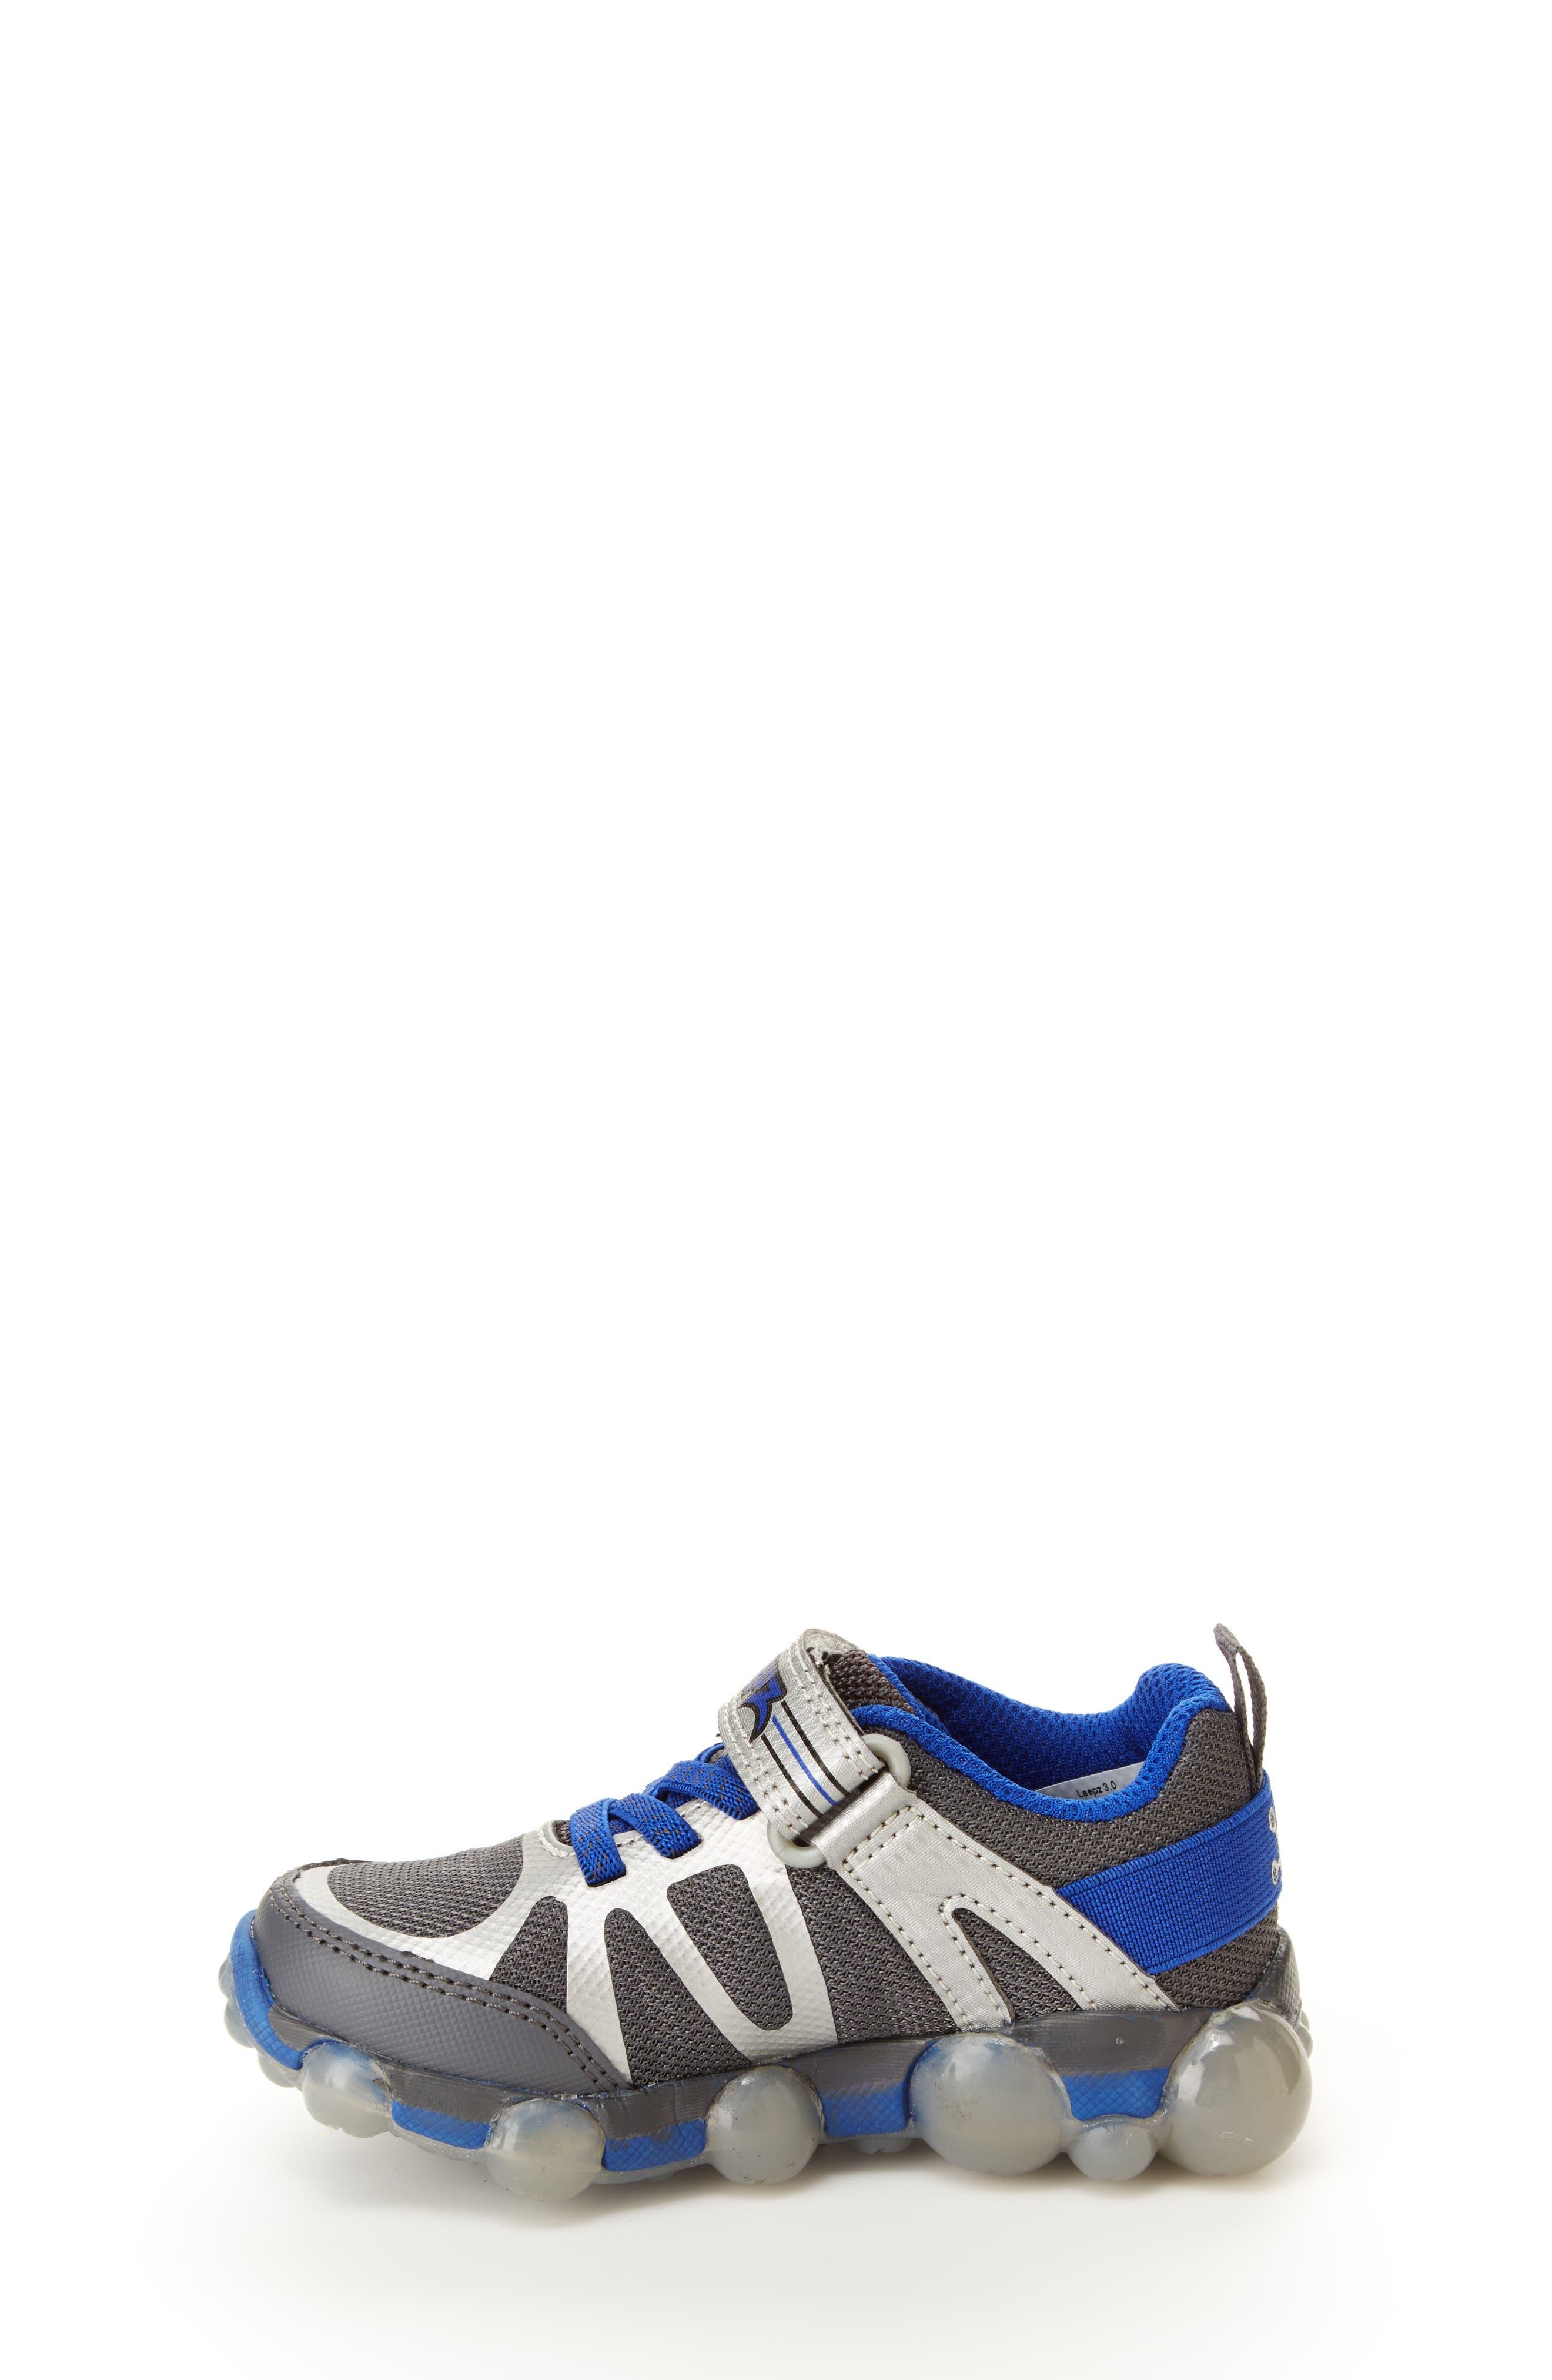 Leepz 3.0 Light-Up Sneaker,                             Alternate thumbnail 7, color,                             DARK GREY/ BLUE